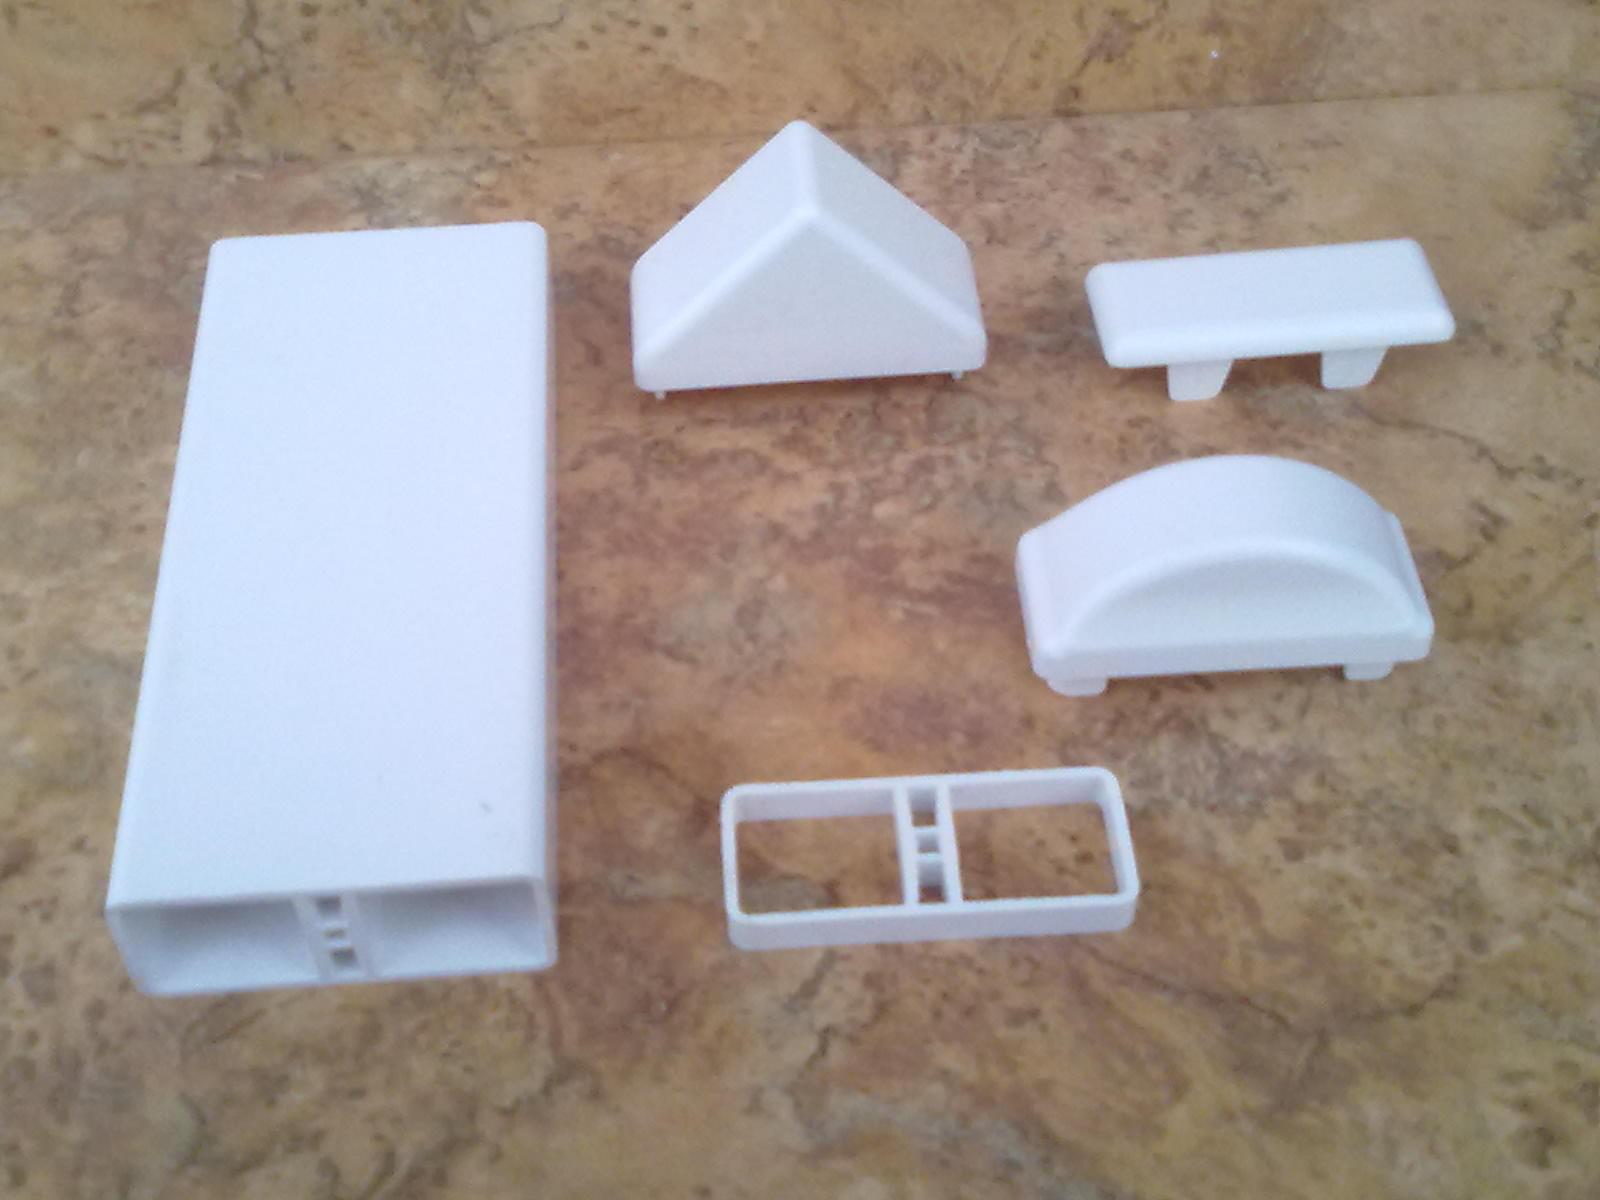 Muster 1A Kunststoff Zaunlatte Zaunbrett 60x25x2mm weiß Zaun, Balkon, Geländer